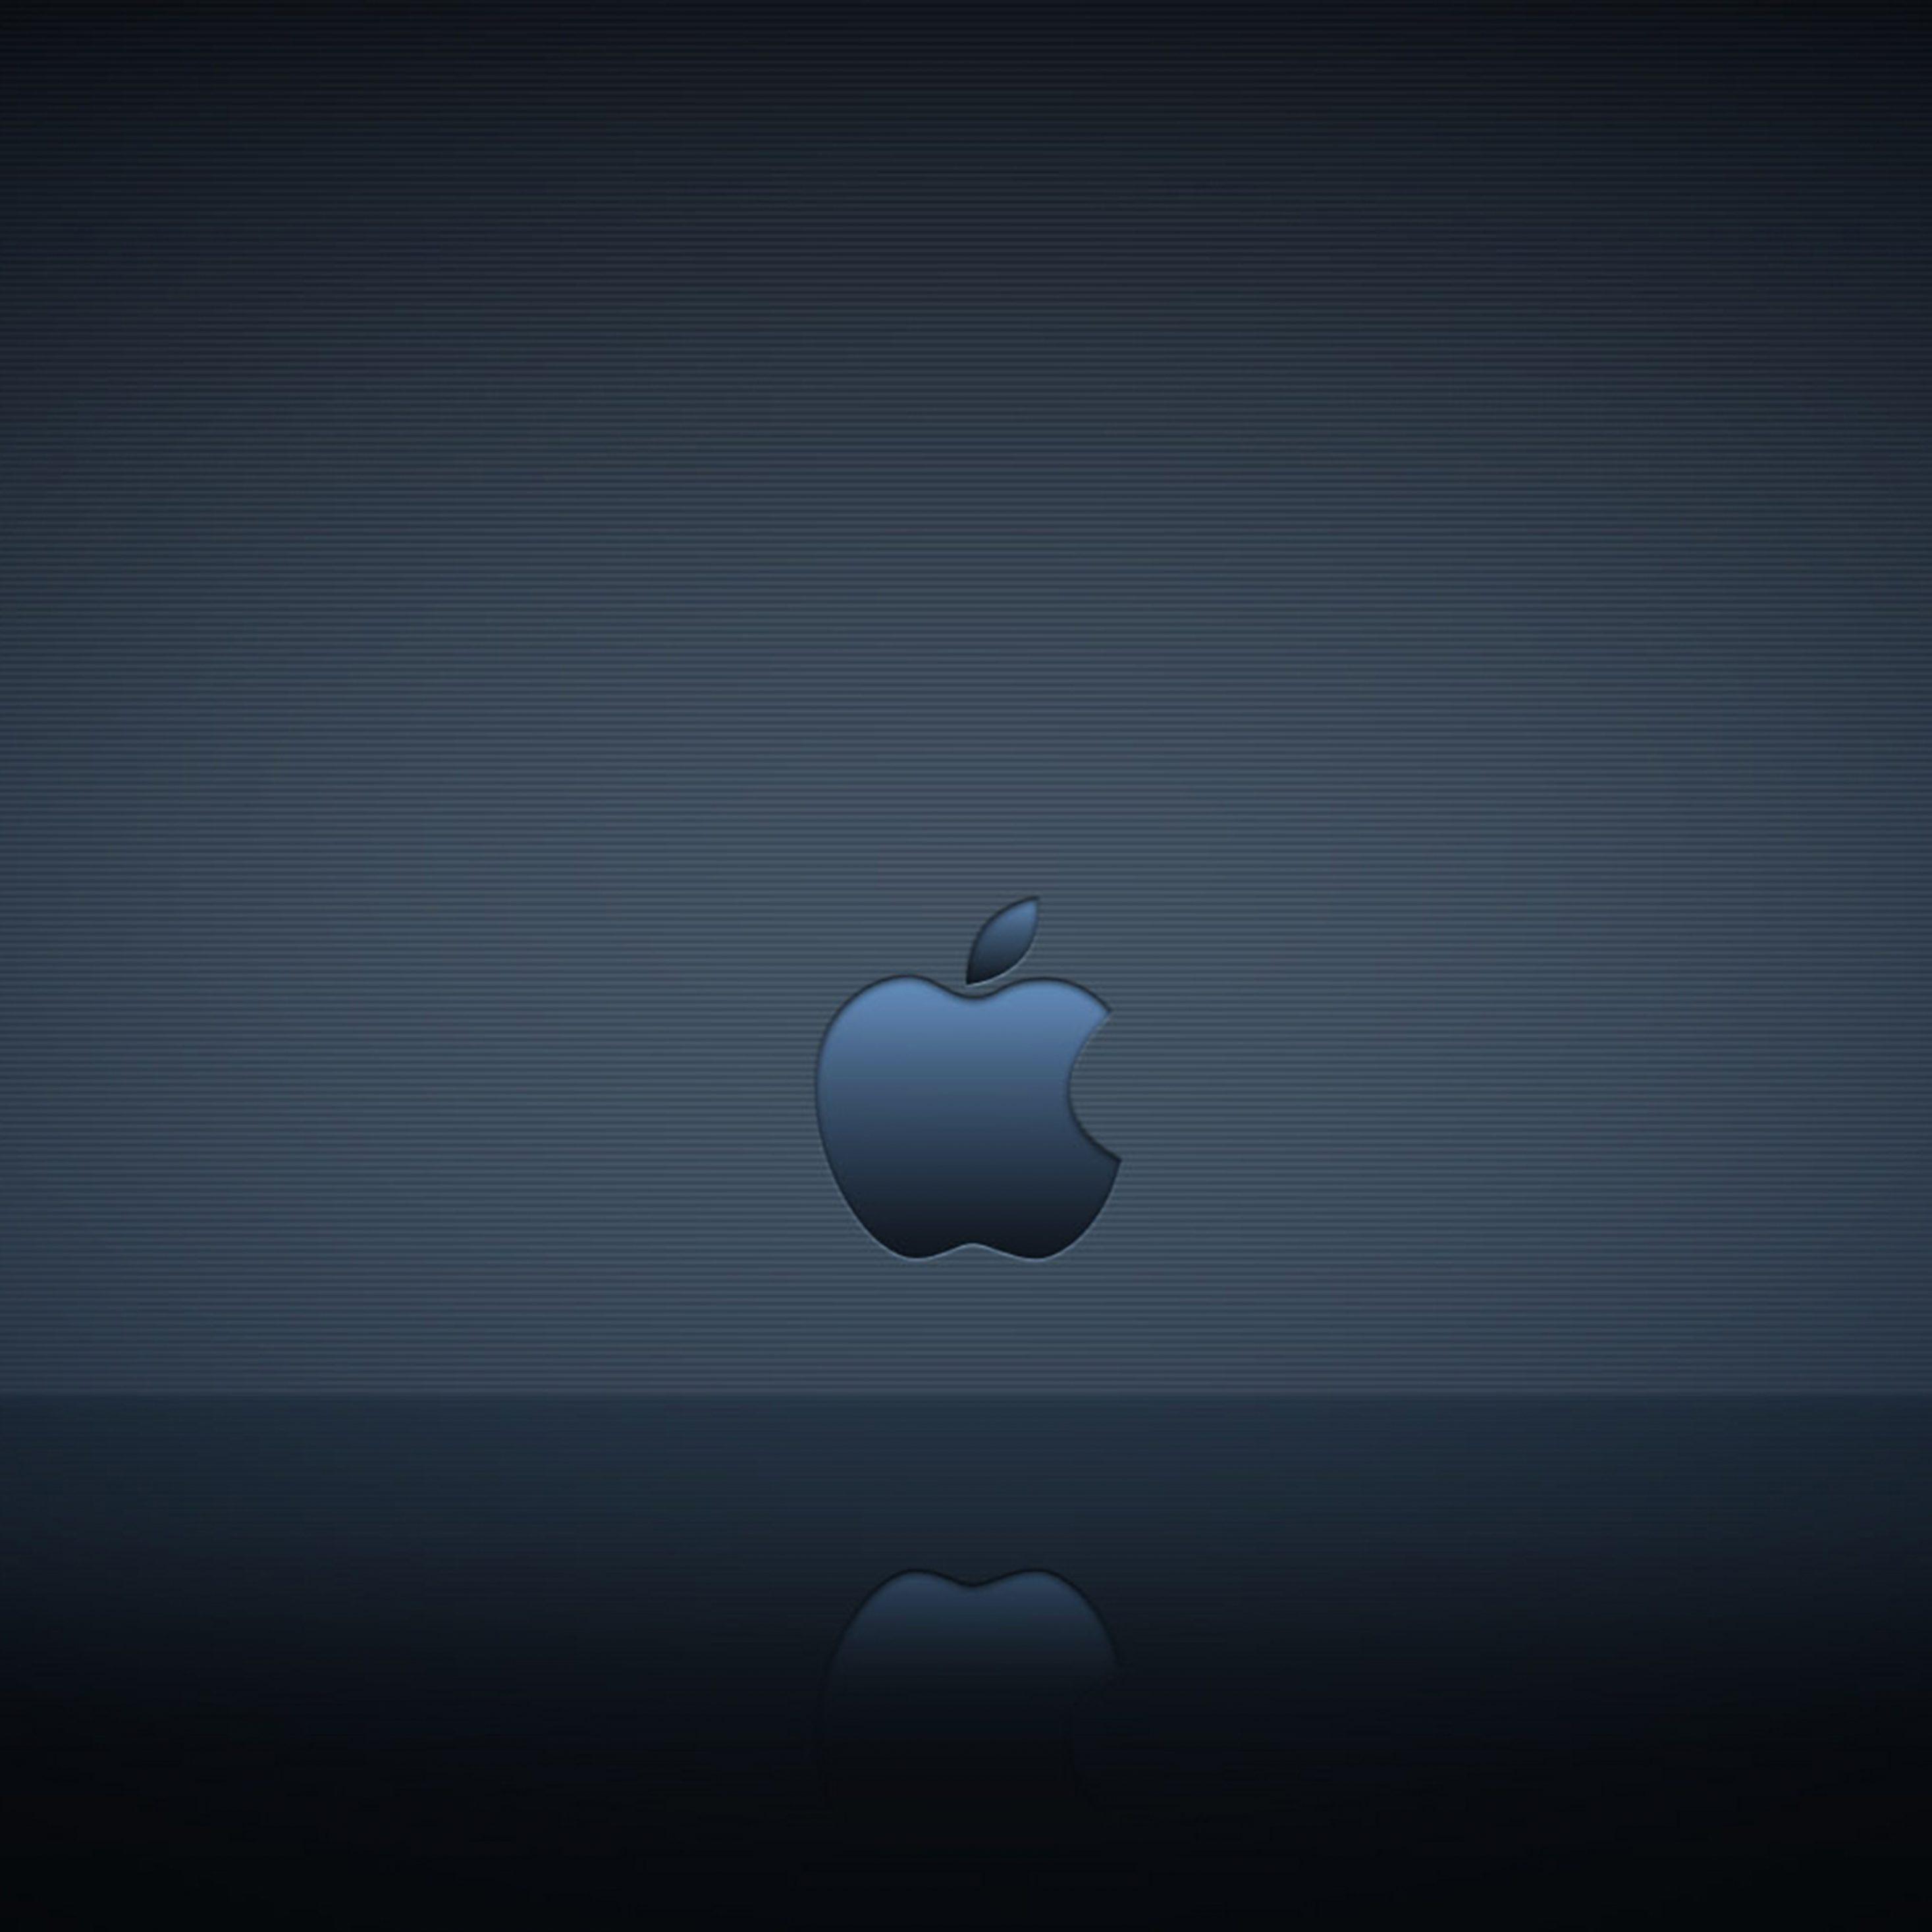 2934x2934 iOS iPad wallpaper 4k Apple Logo Reflection Ipad Wallpaper 2934x2934 pixels resolution